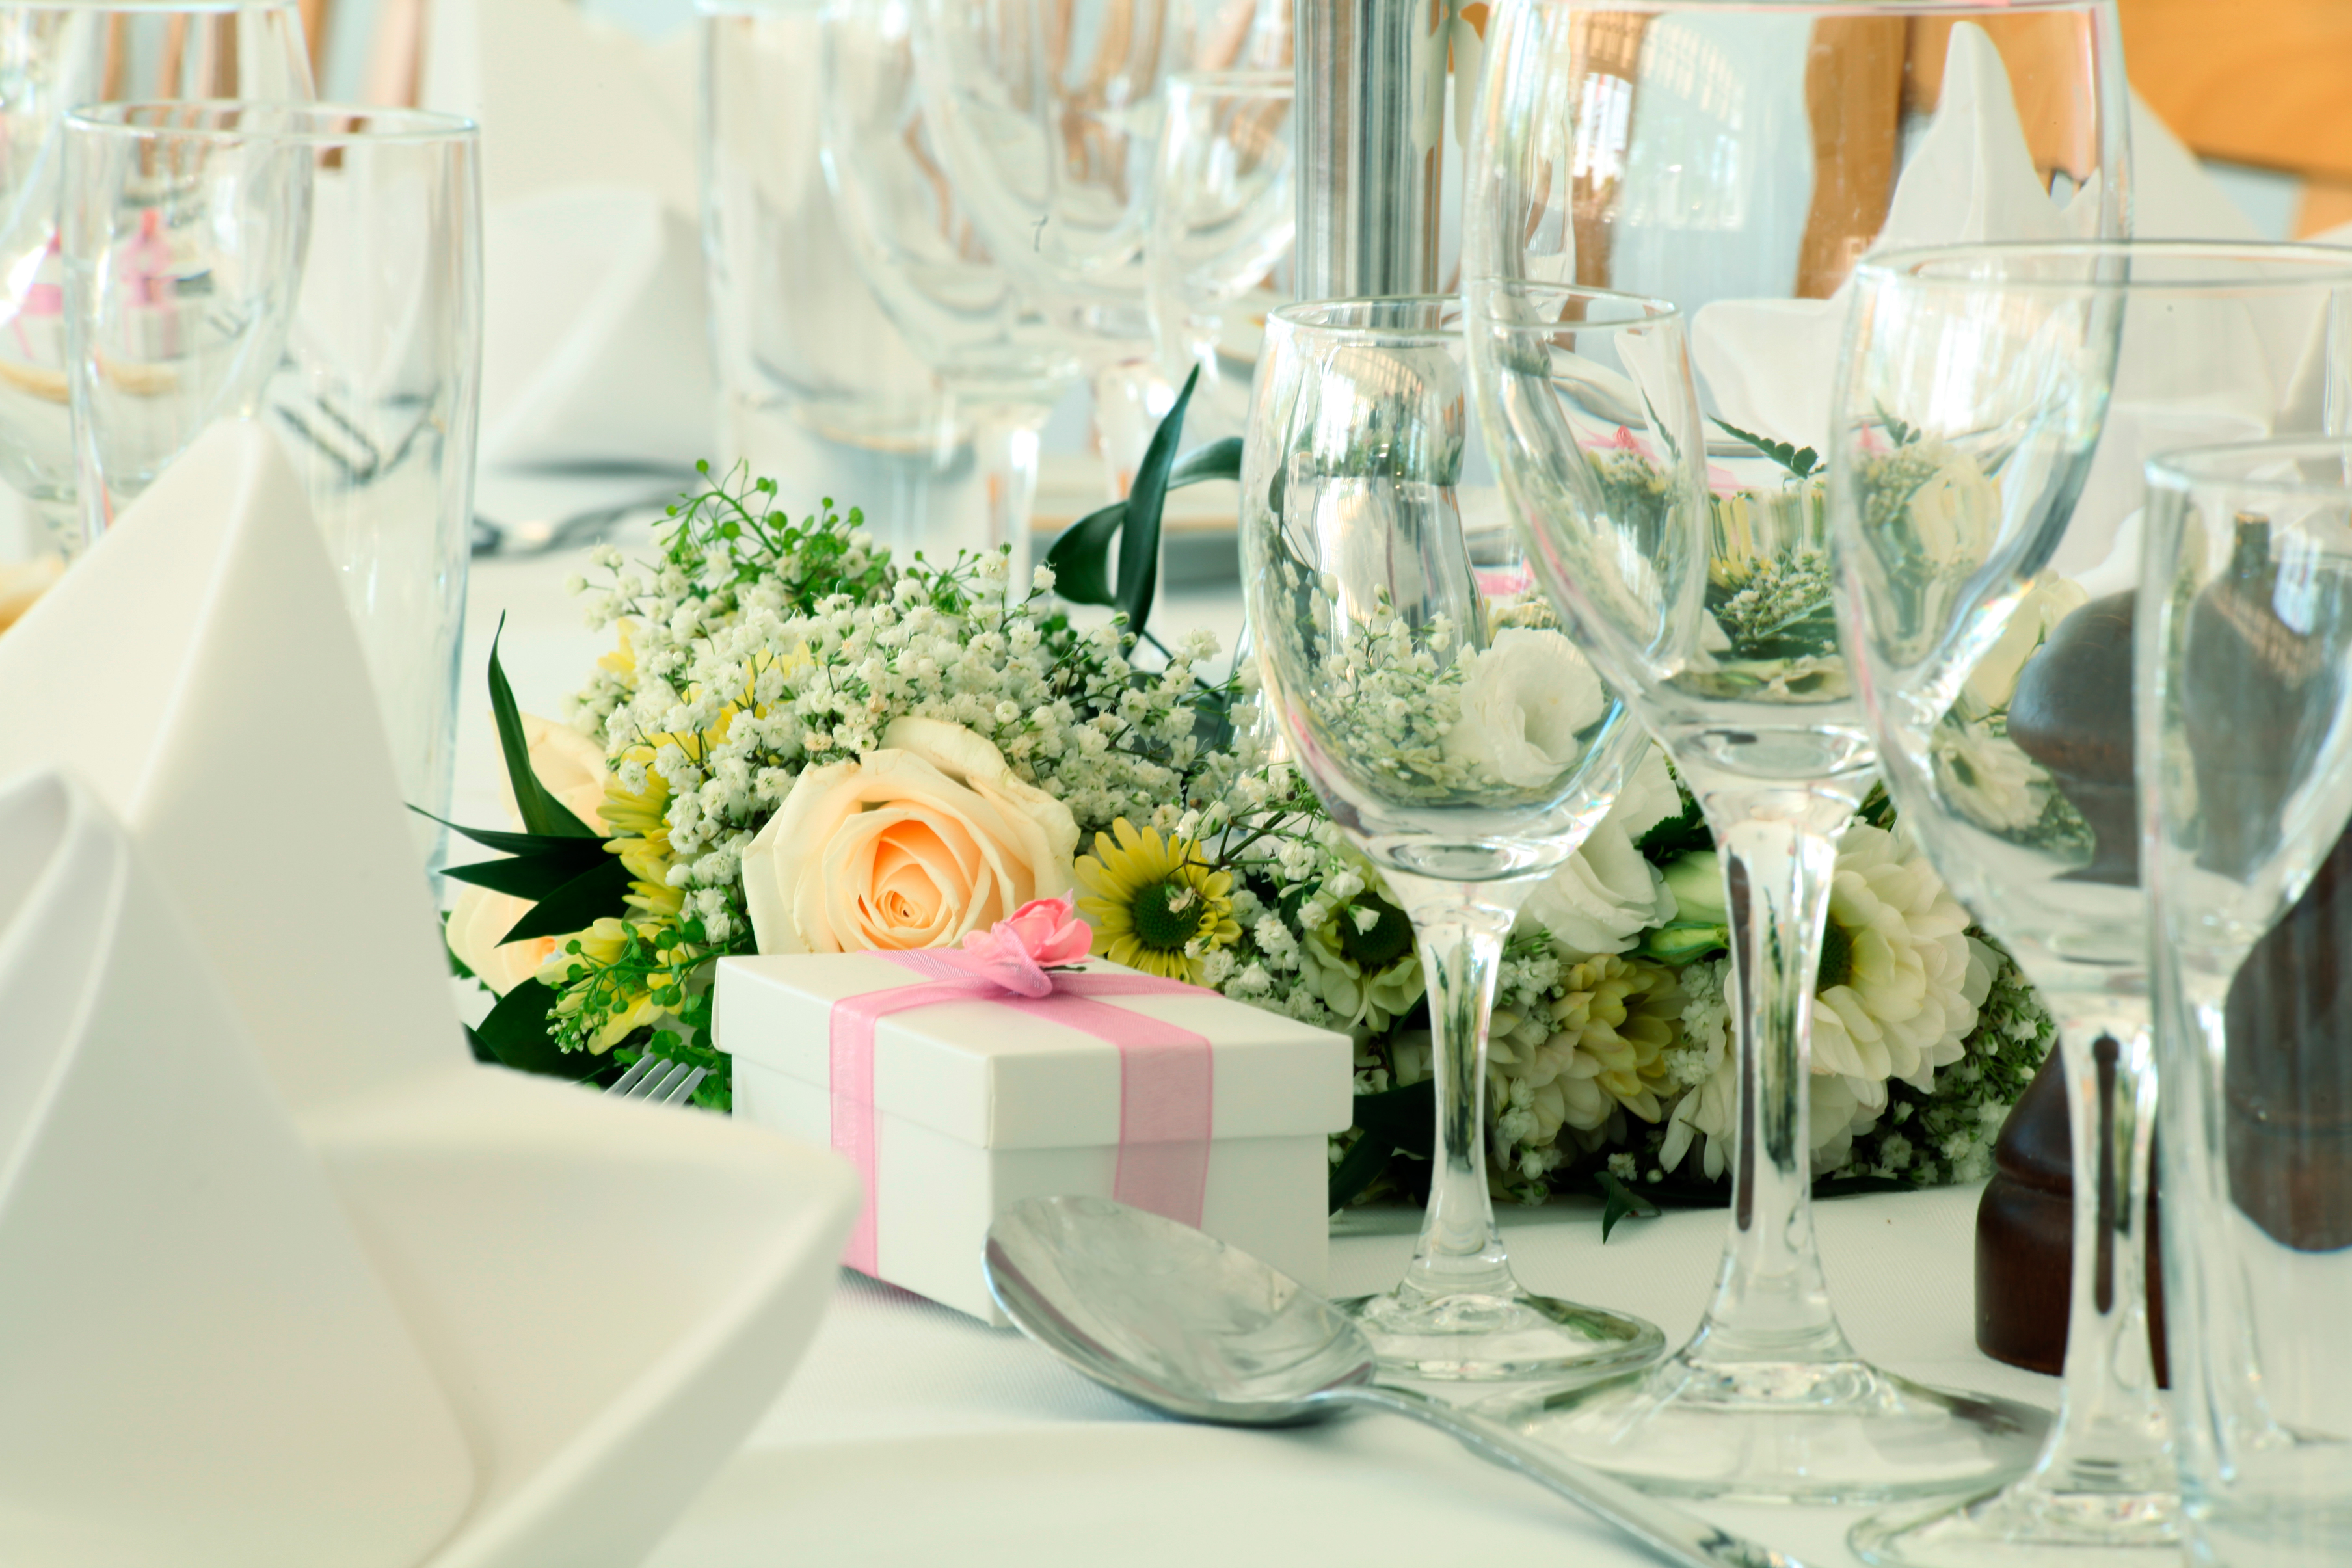 Ølsted Kro - konfirmation, bryllupsfest